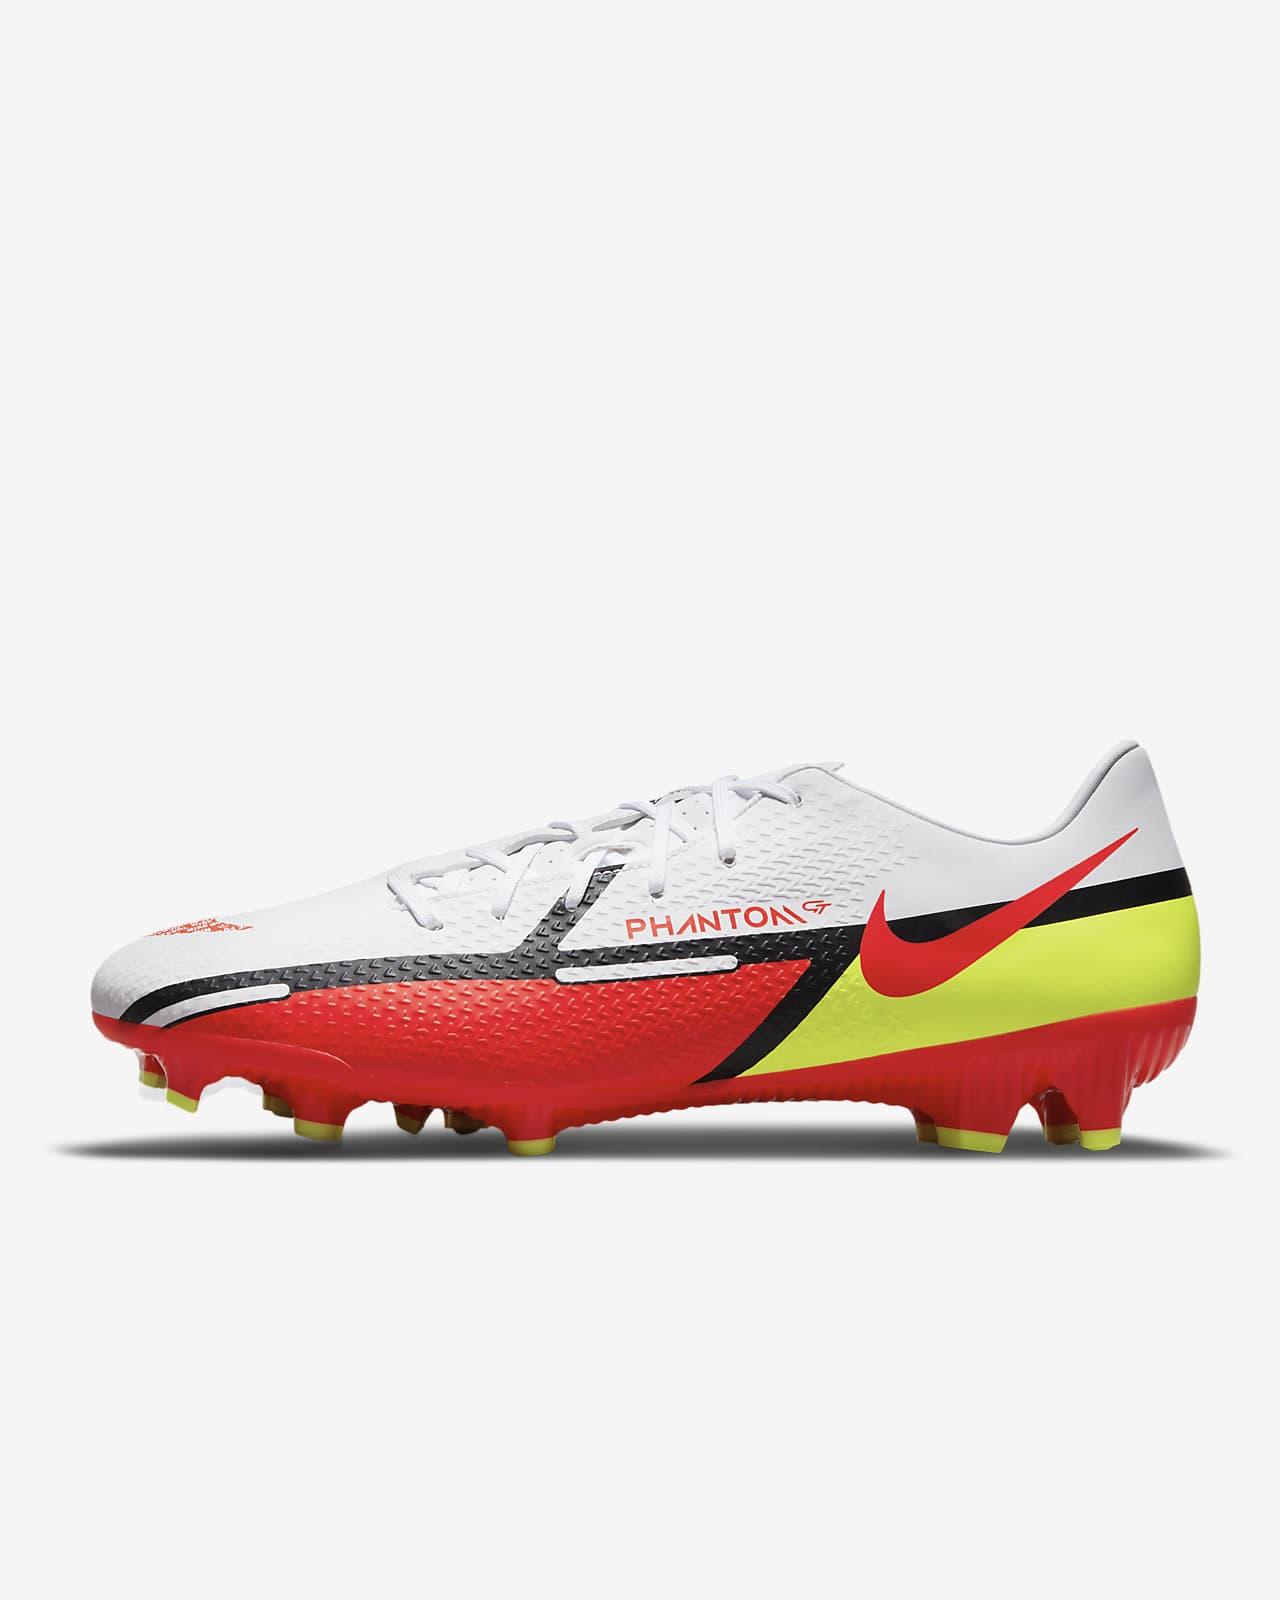 Nike Phantom GT2 Academy MG Multi-Ground Football Boot